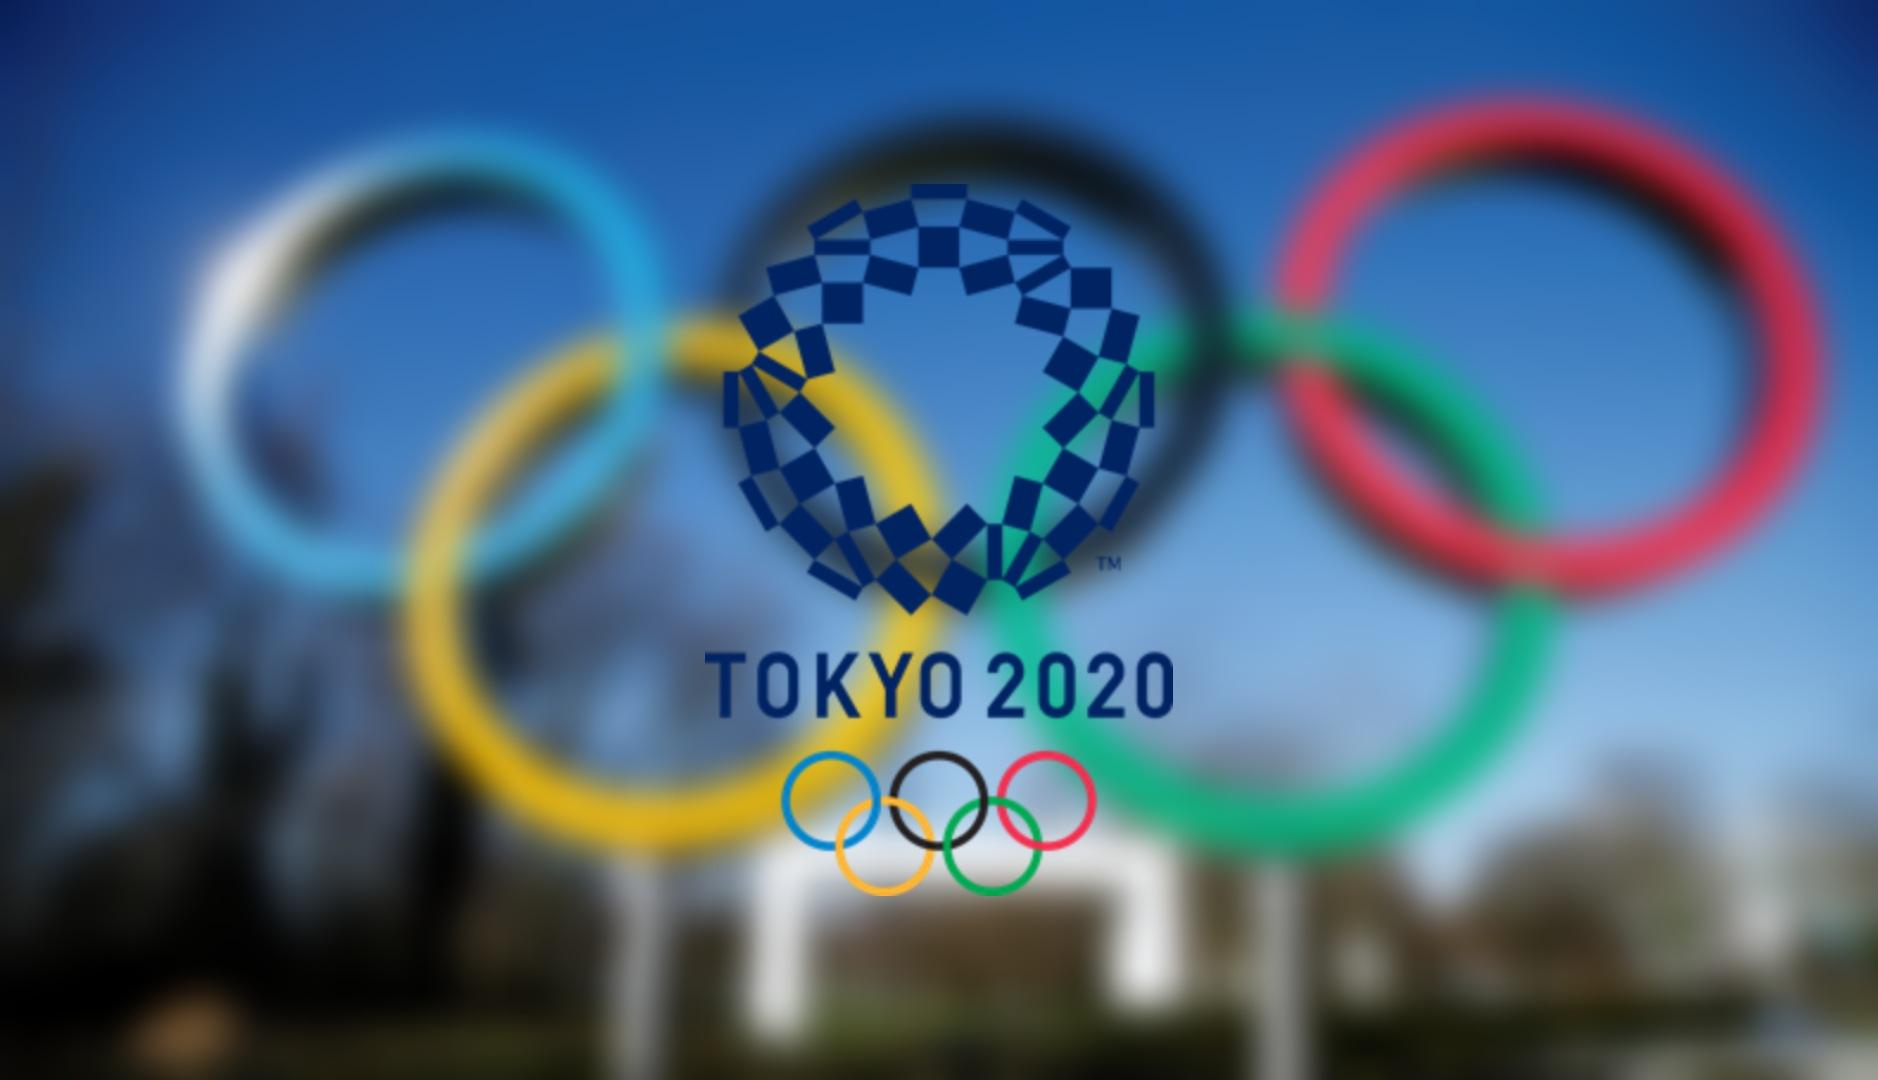 Jadual Siaran Langsung Sukan Olimpik 2020 Waktu Malaysia (RTM & Astro)